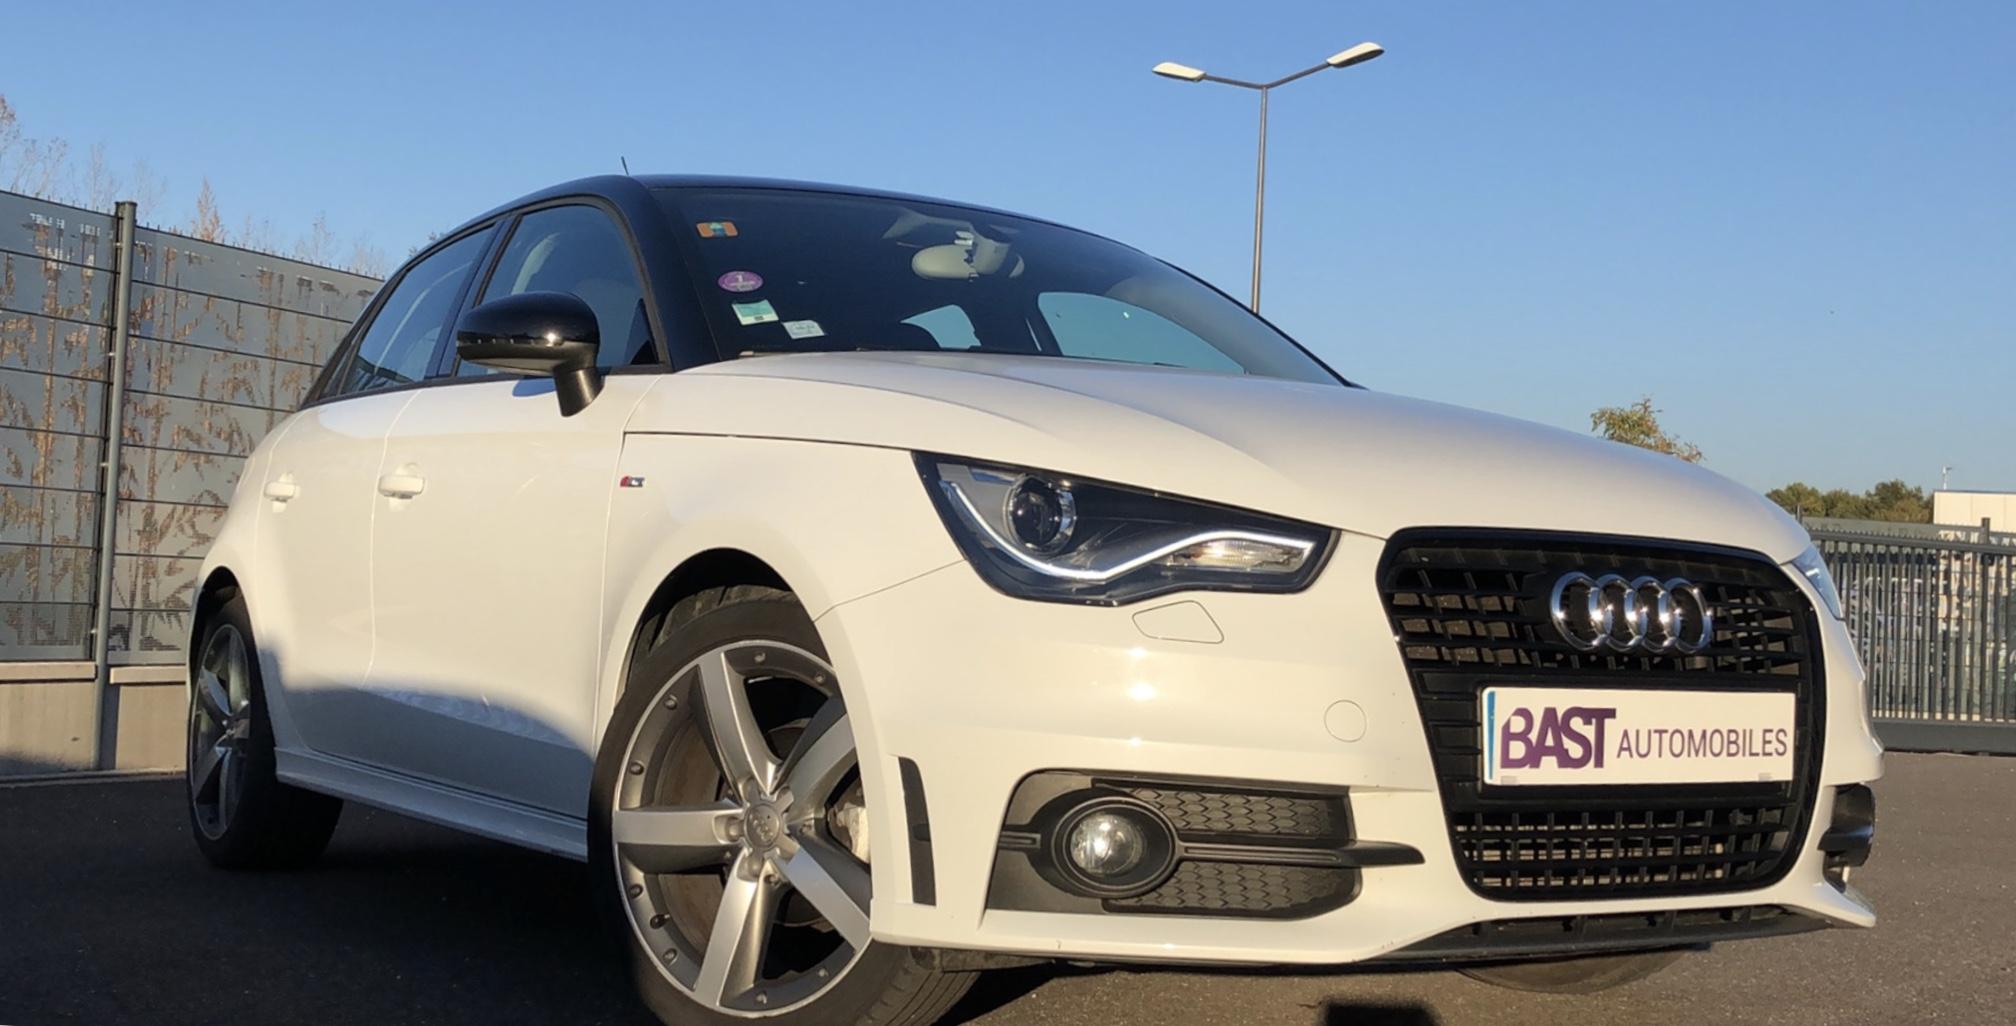 Audi A1 S line TFSI Image